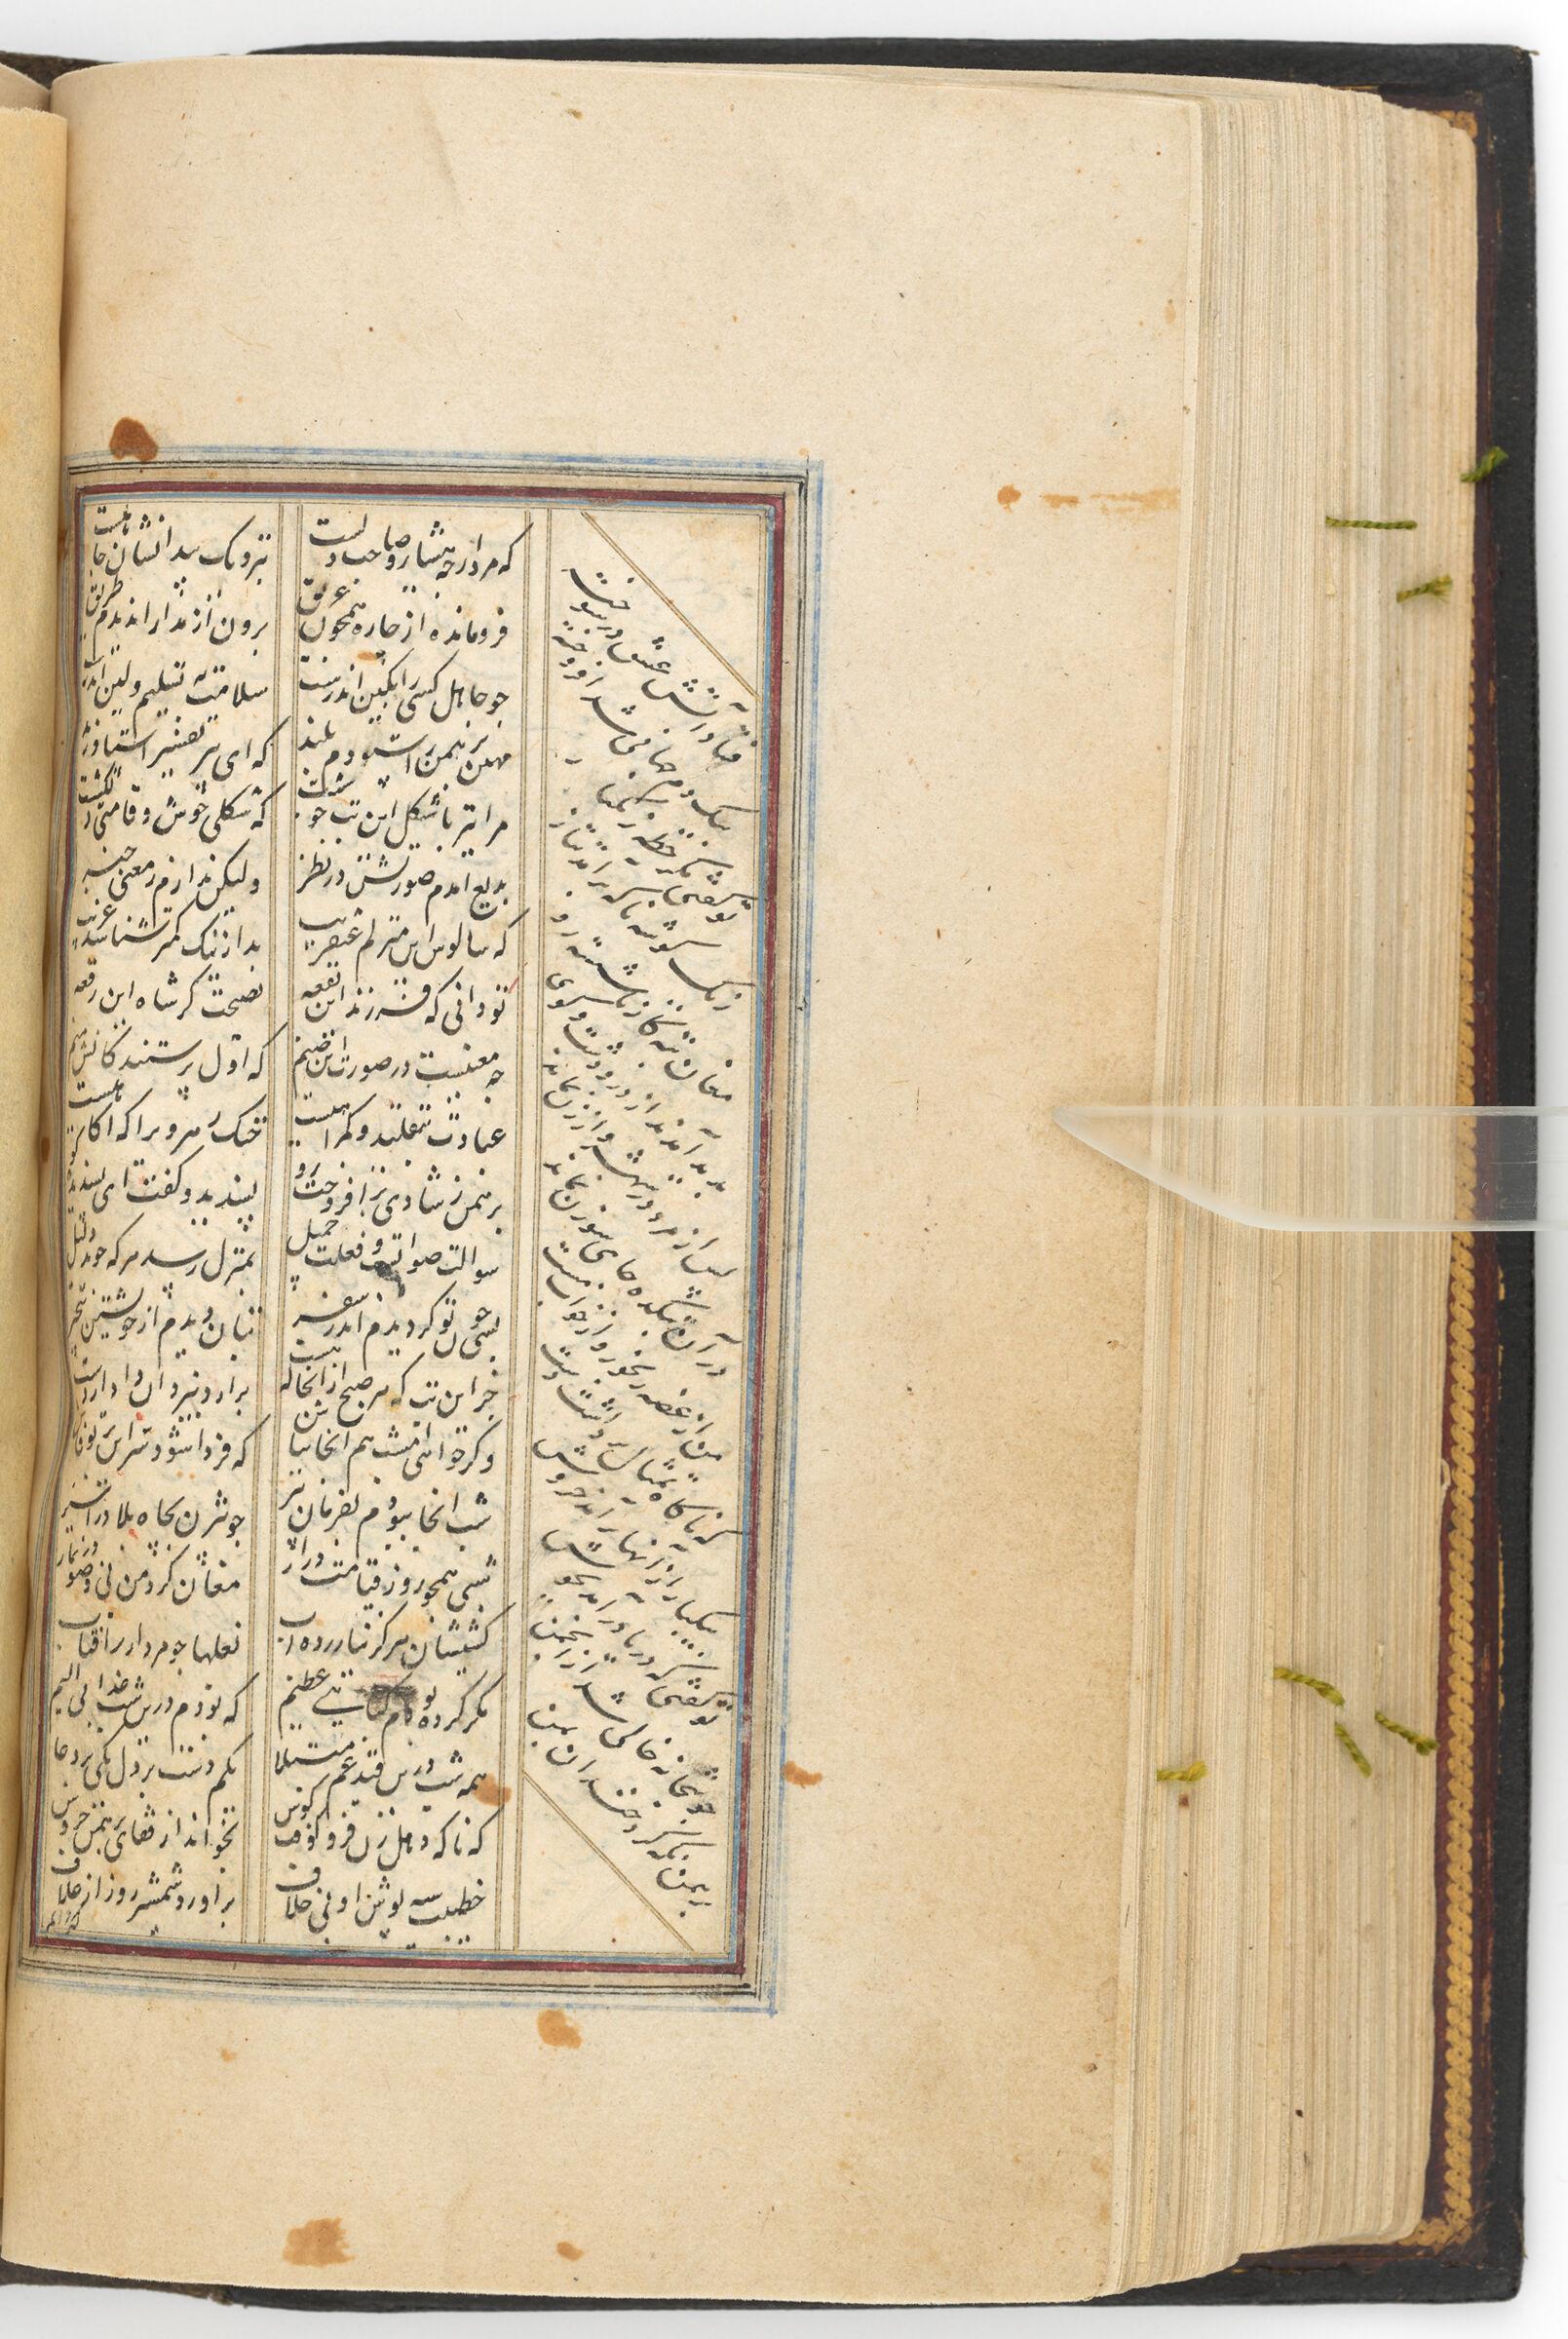 Text Folio (Text Recto; Text Verso Of Folio 143), From A Manuscript Of The Kulliyat Of Sa'di